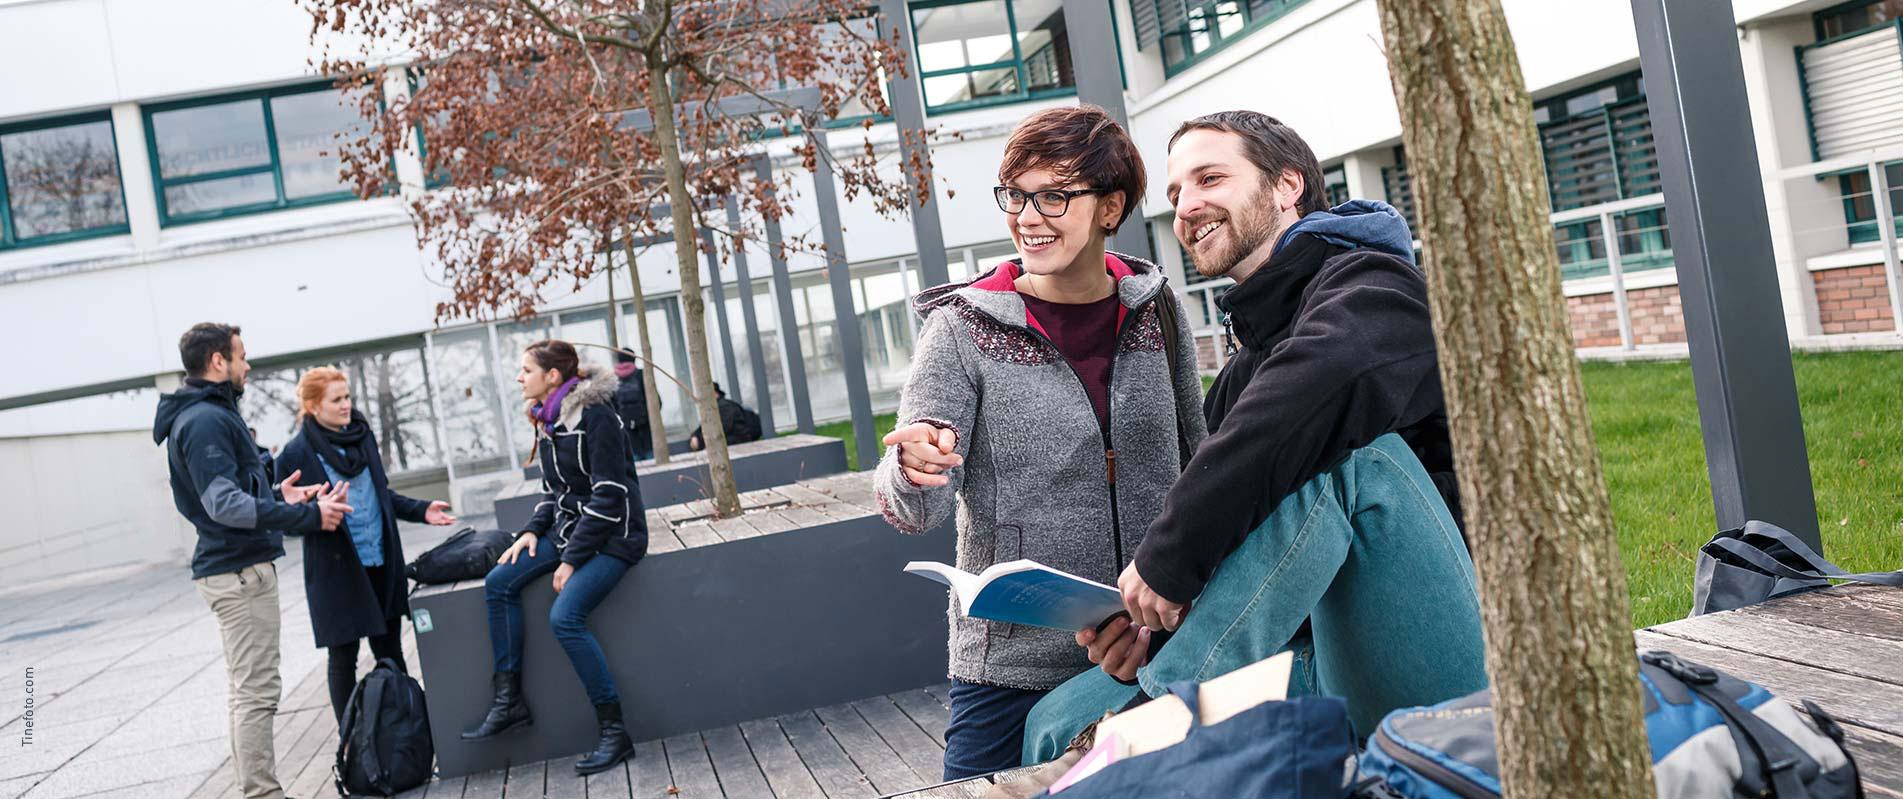 Alpen-Adria-Universität Studierende | Foto: tinefoto.com